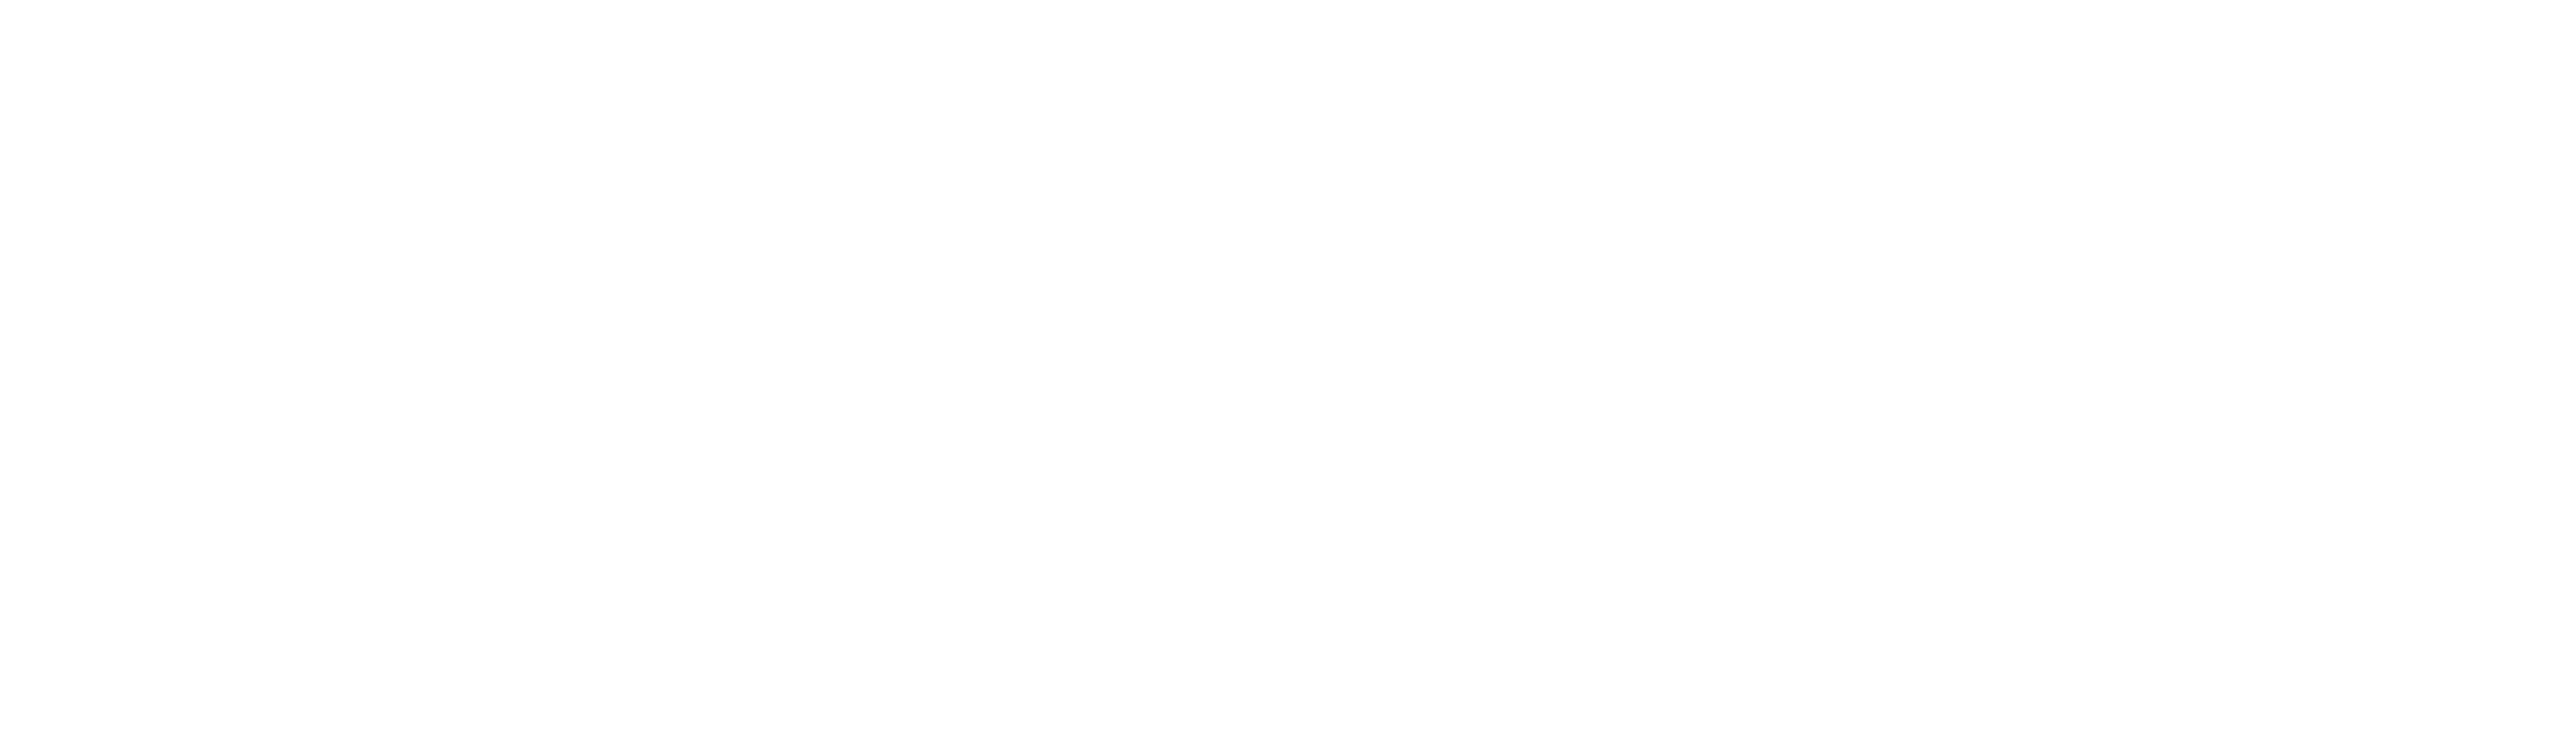 HeartlandBank_TrustCompany